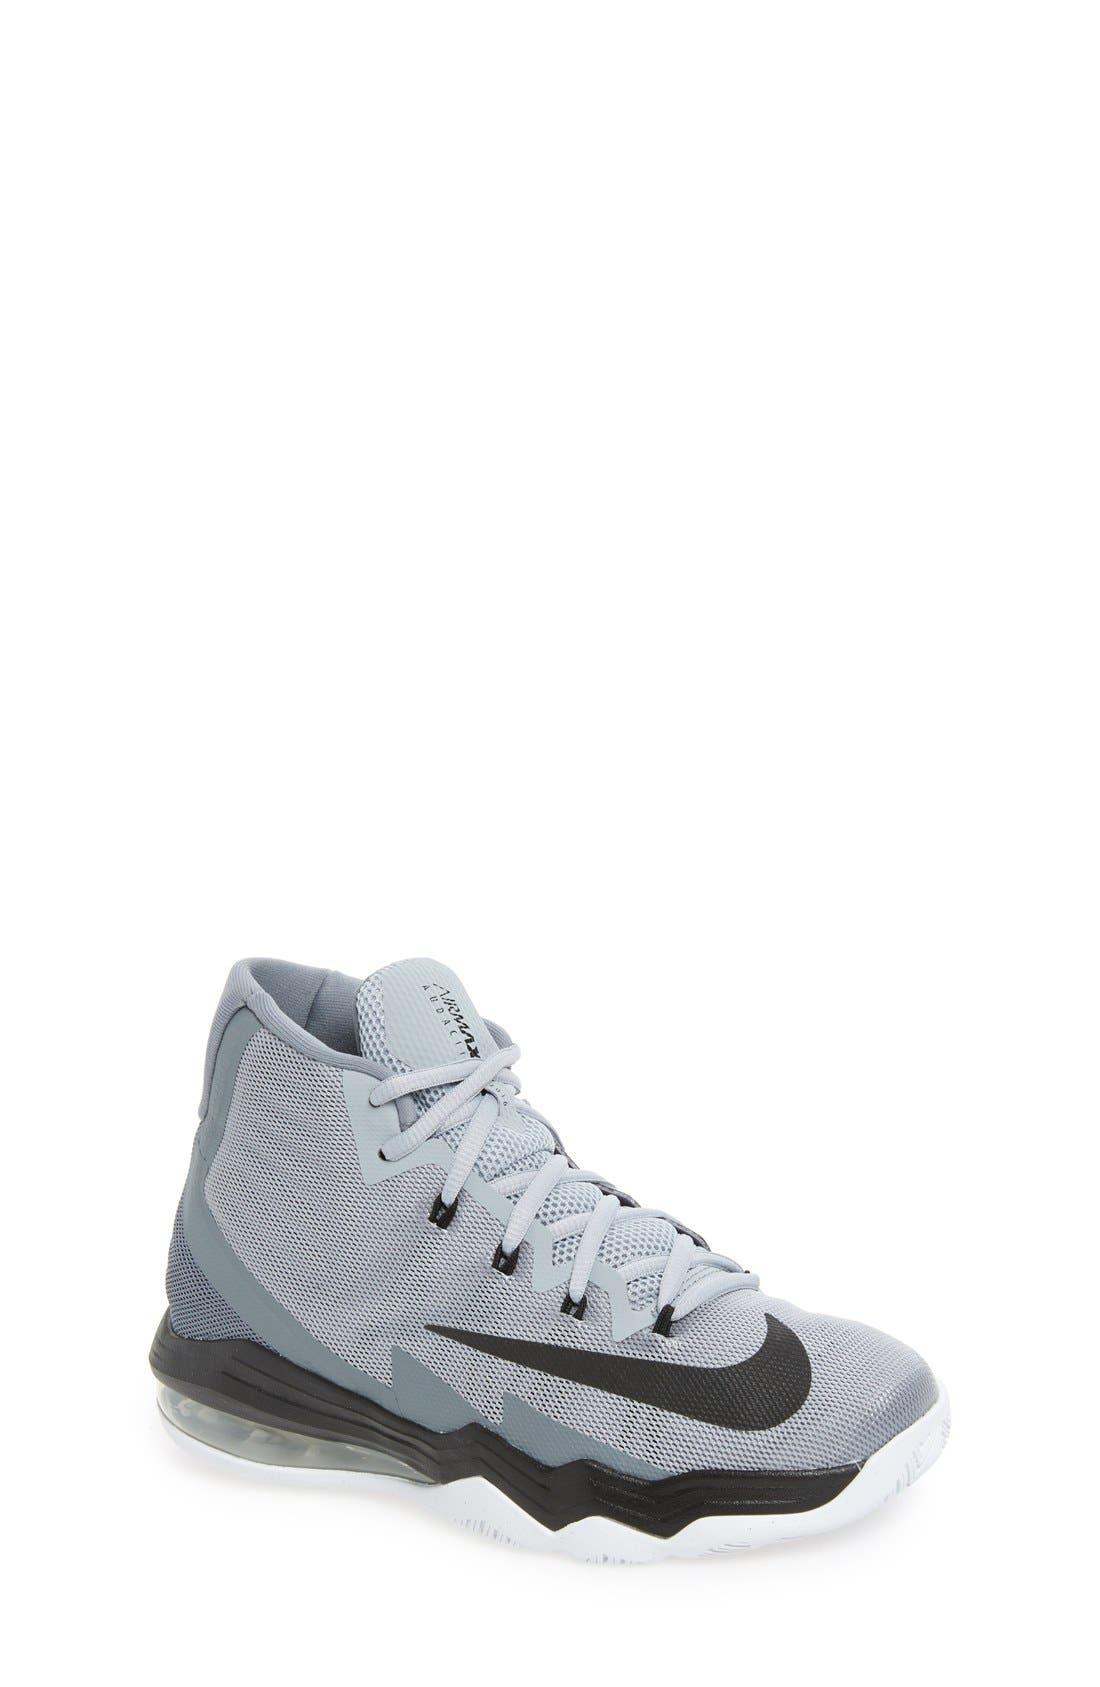 Main Image - Nike Air Max Audacity 2016 Basketball Shoe (Big Kid)